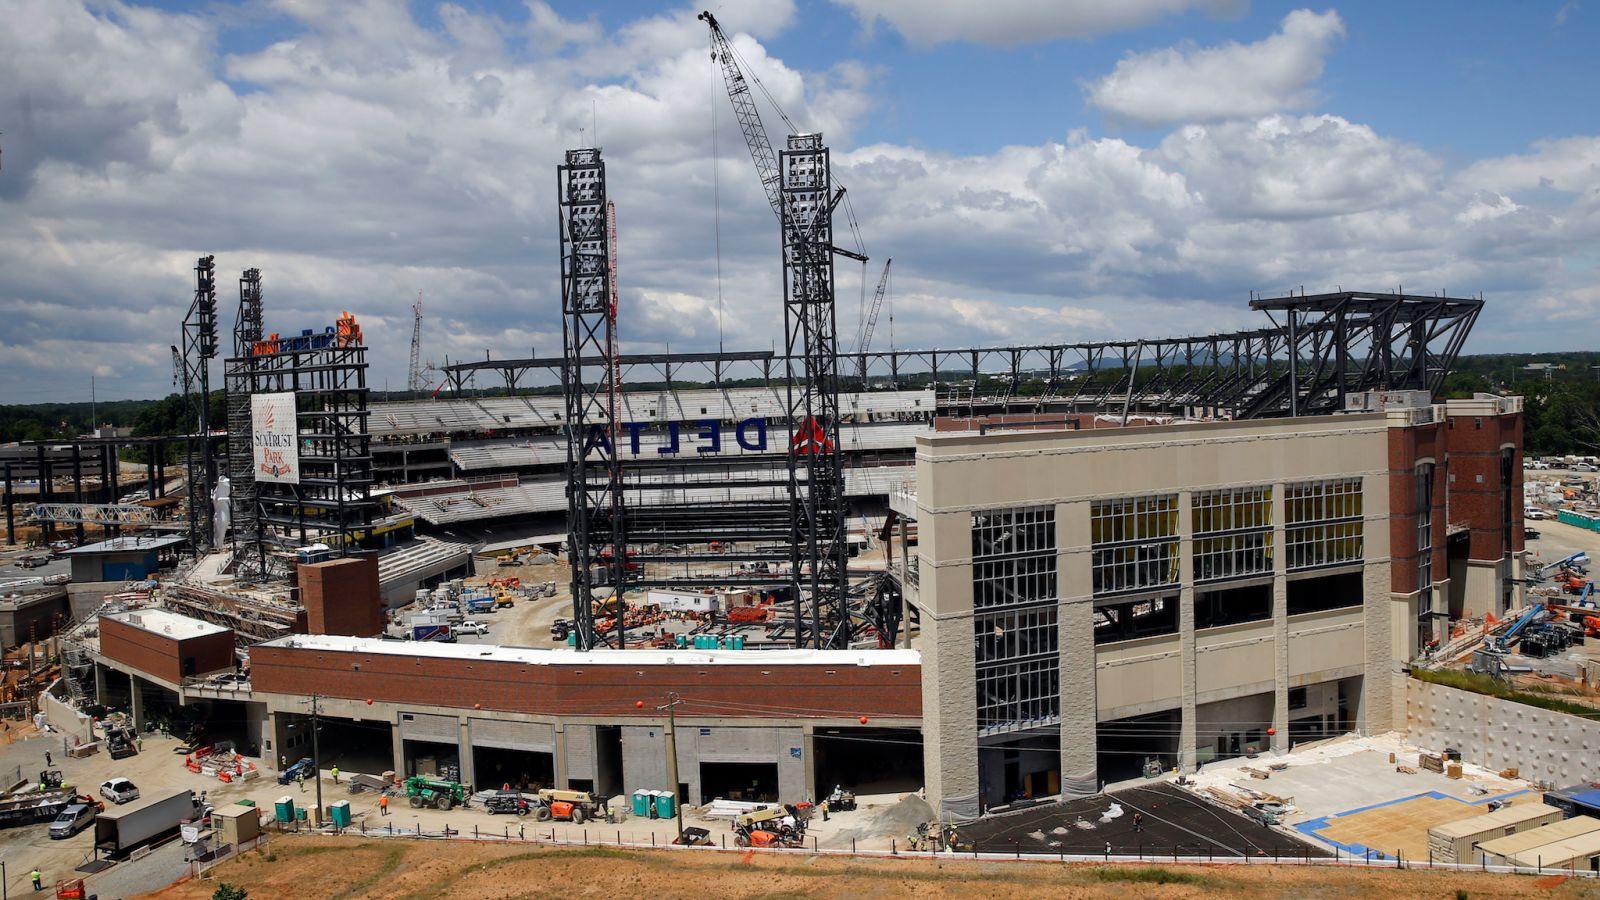 SunTrust Park Braves Stadium construction development